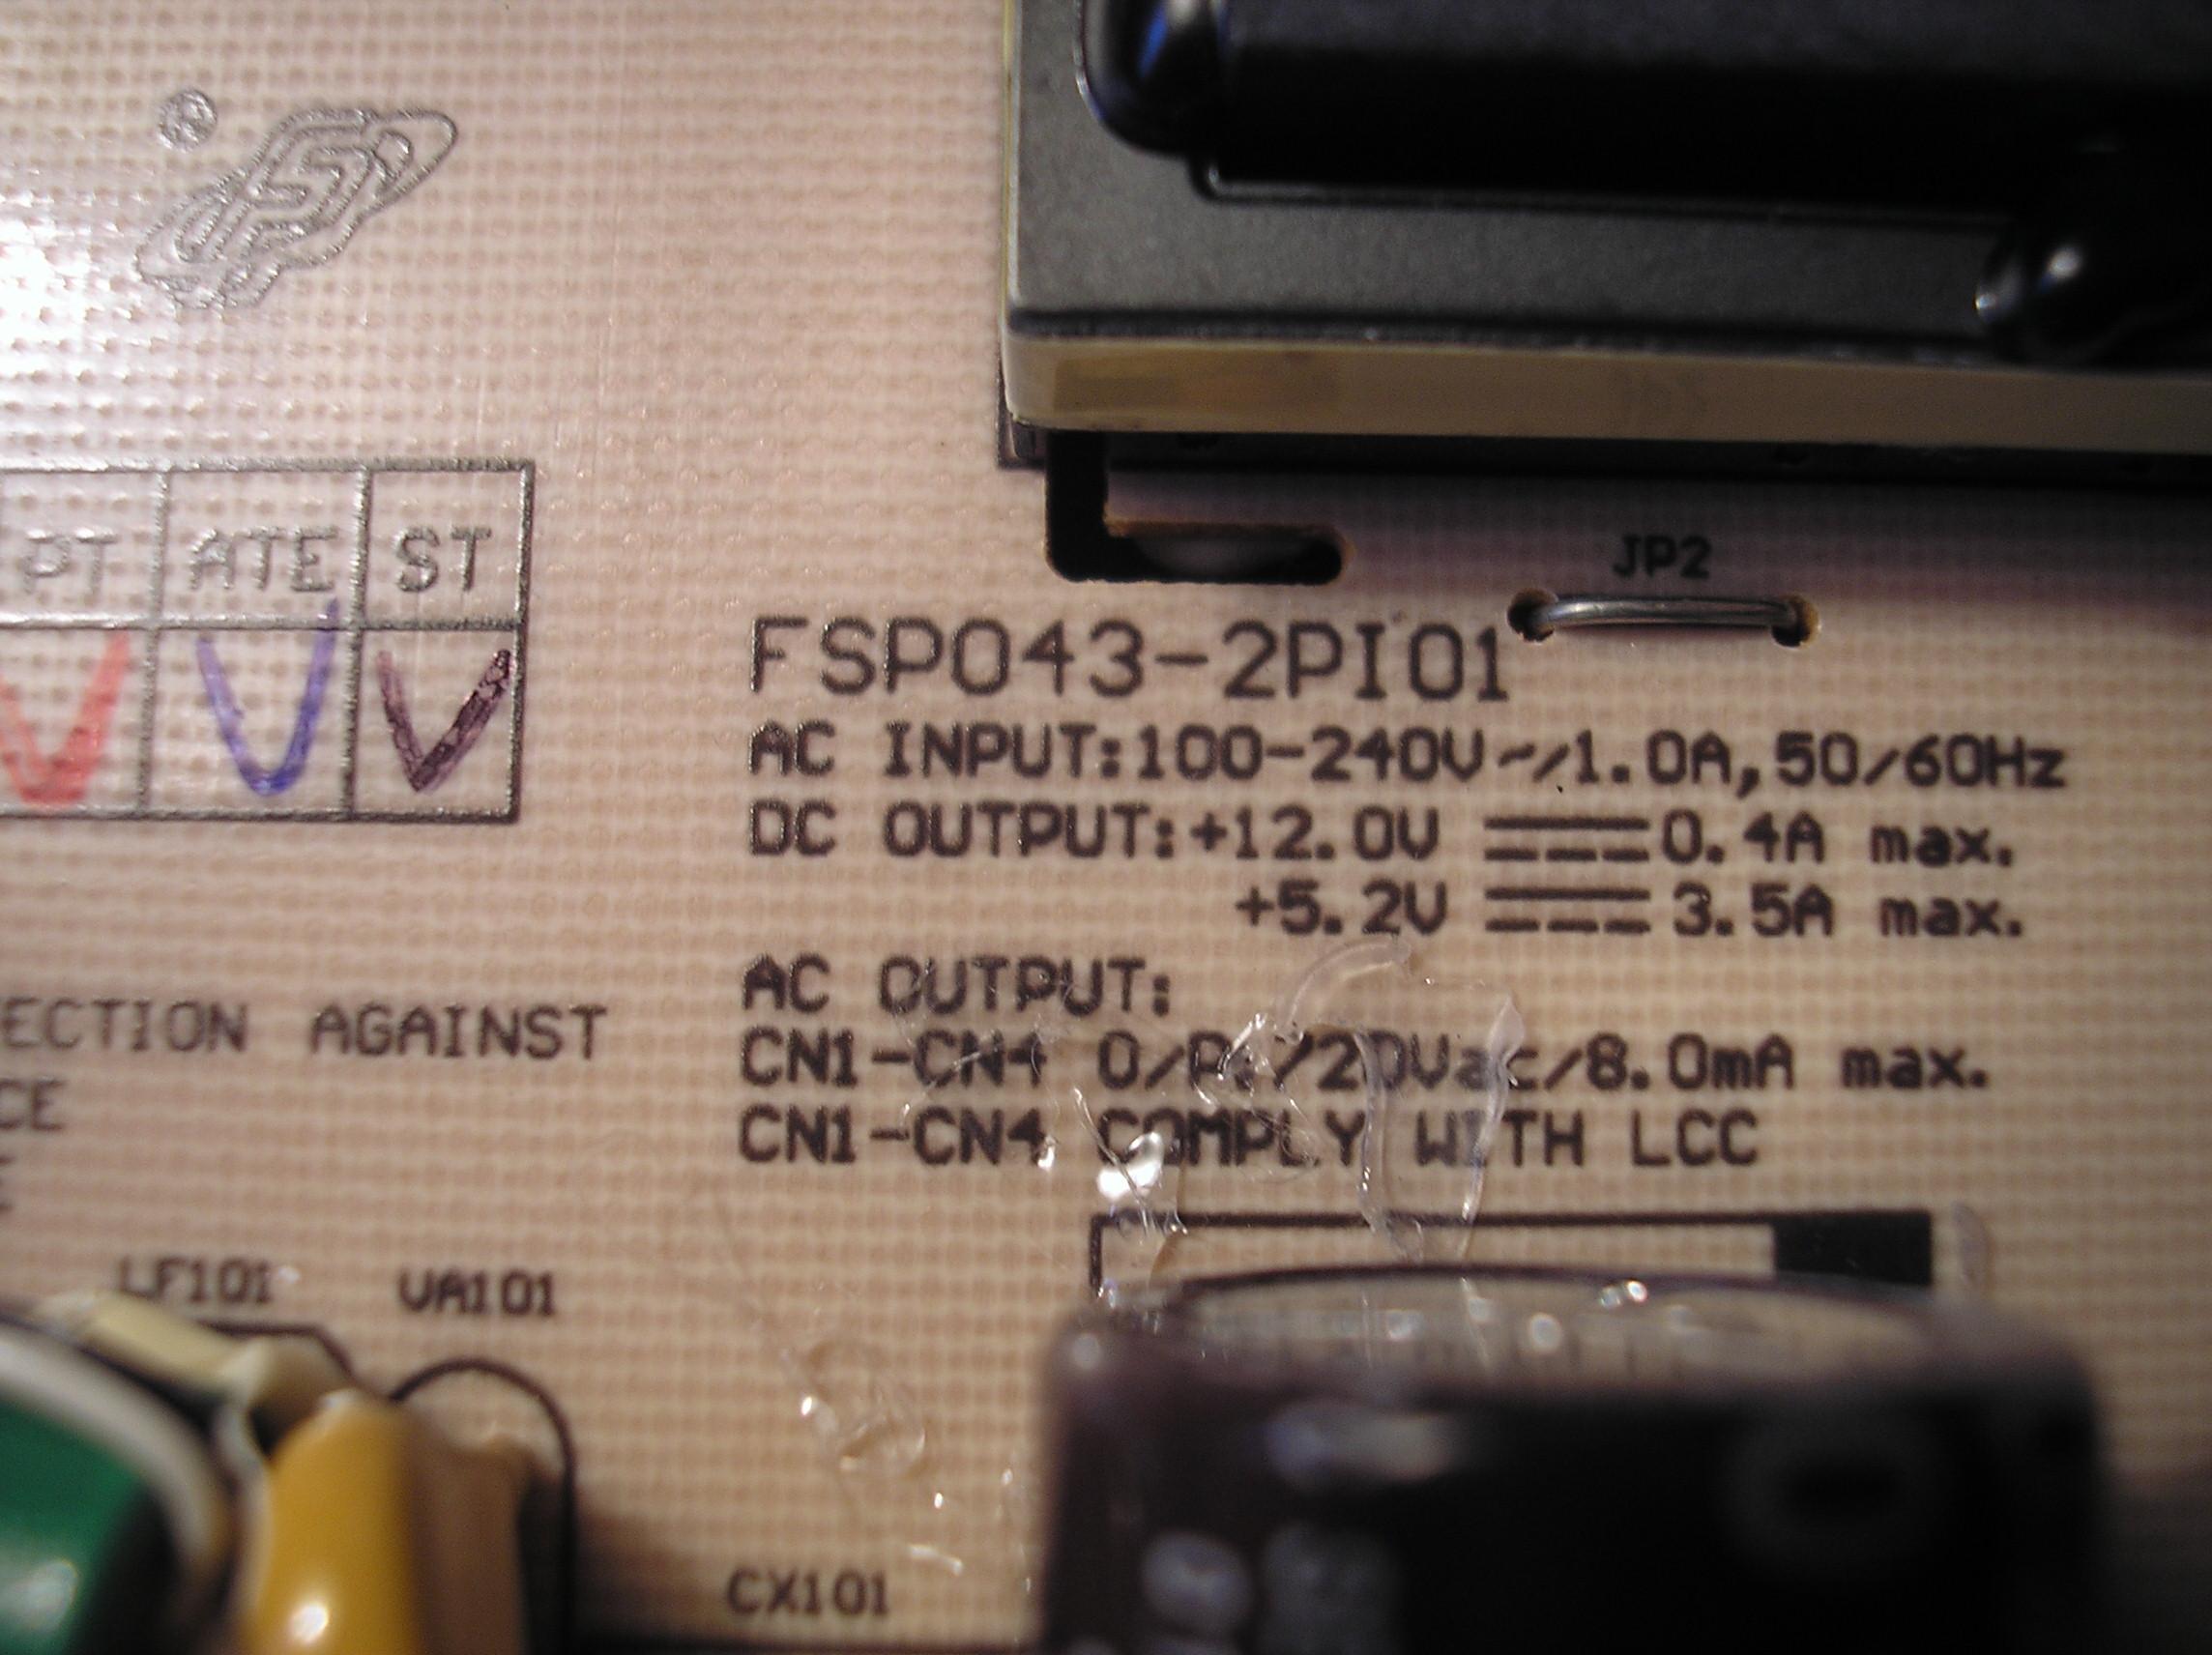 Fujitsu Siemens Scaleoview C17-11 L7ZA-A1 nadal brak obrazu